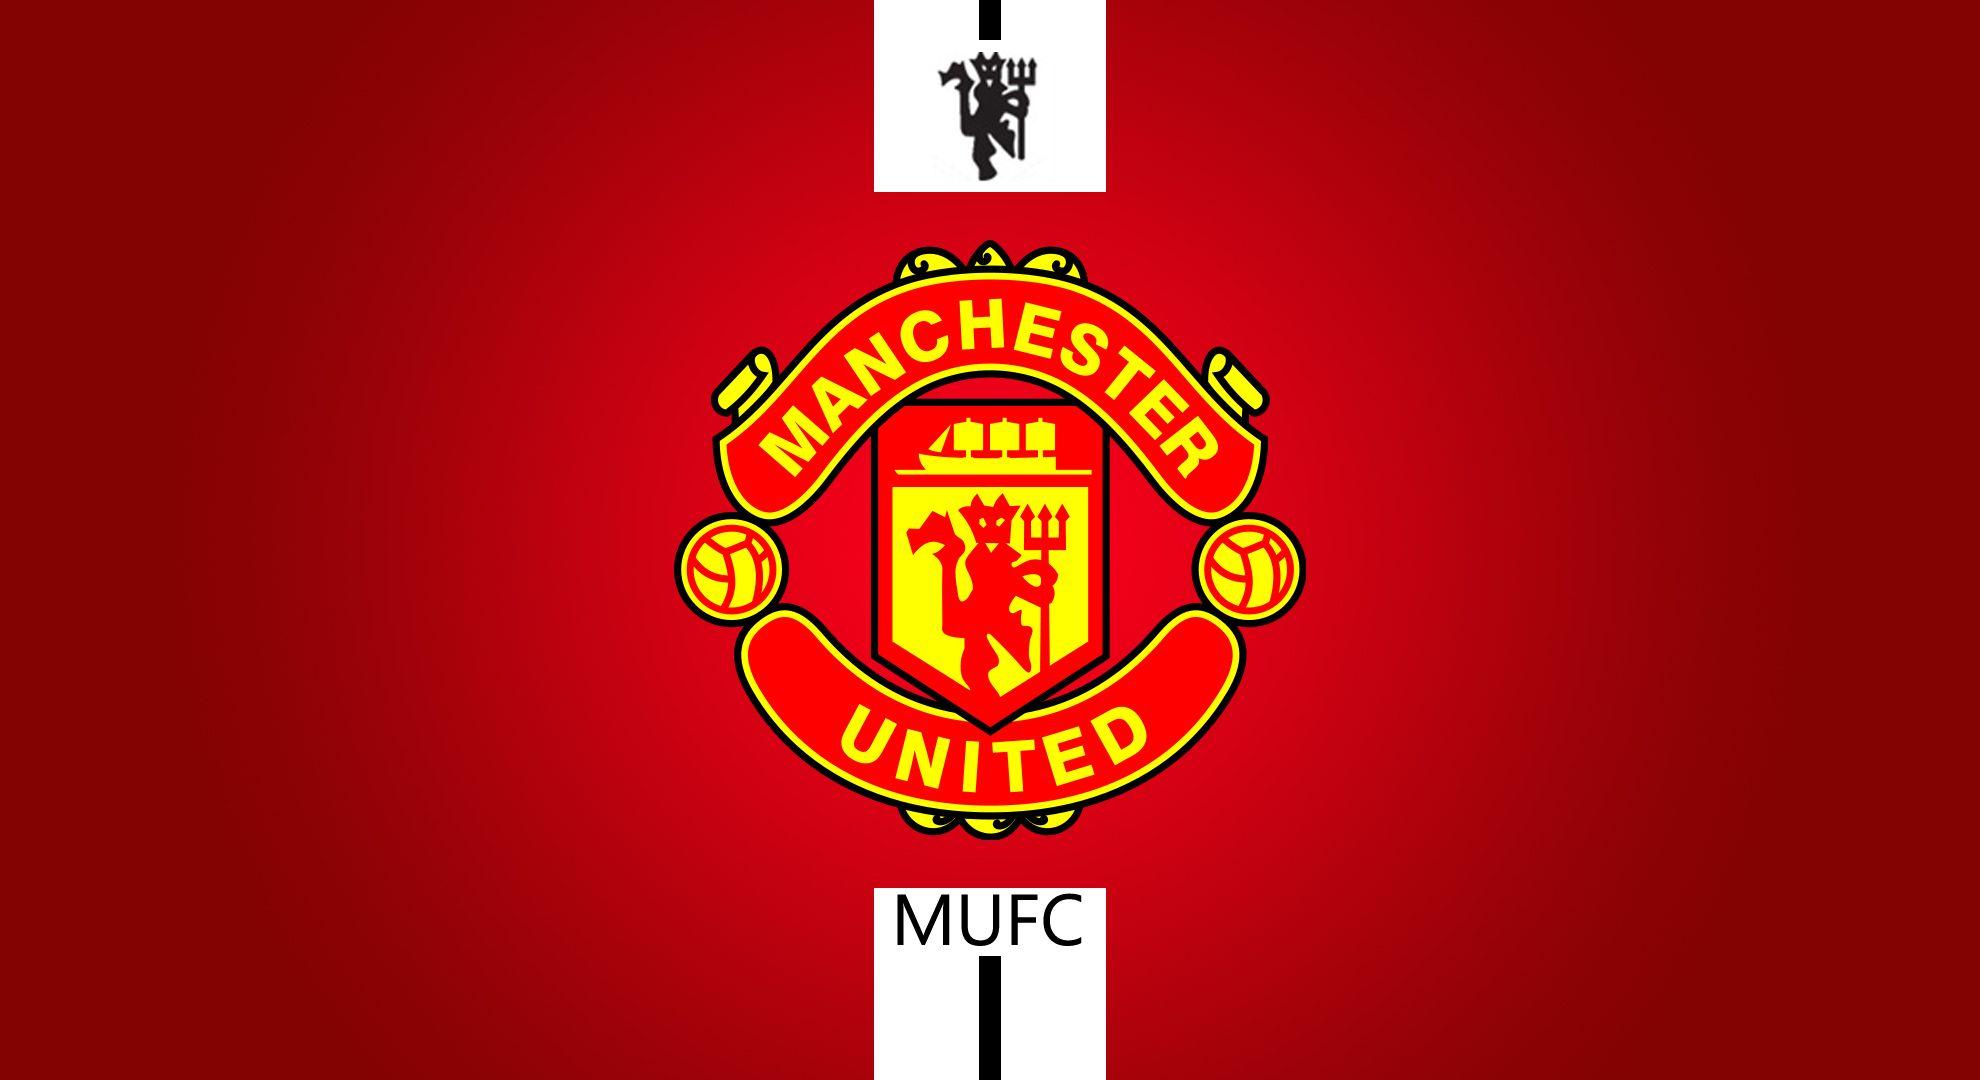 Manchester United Logo Red Background Wallpaper HD Desktop 1980x1080